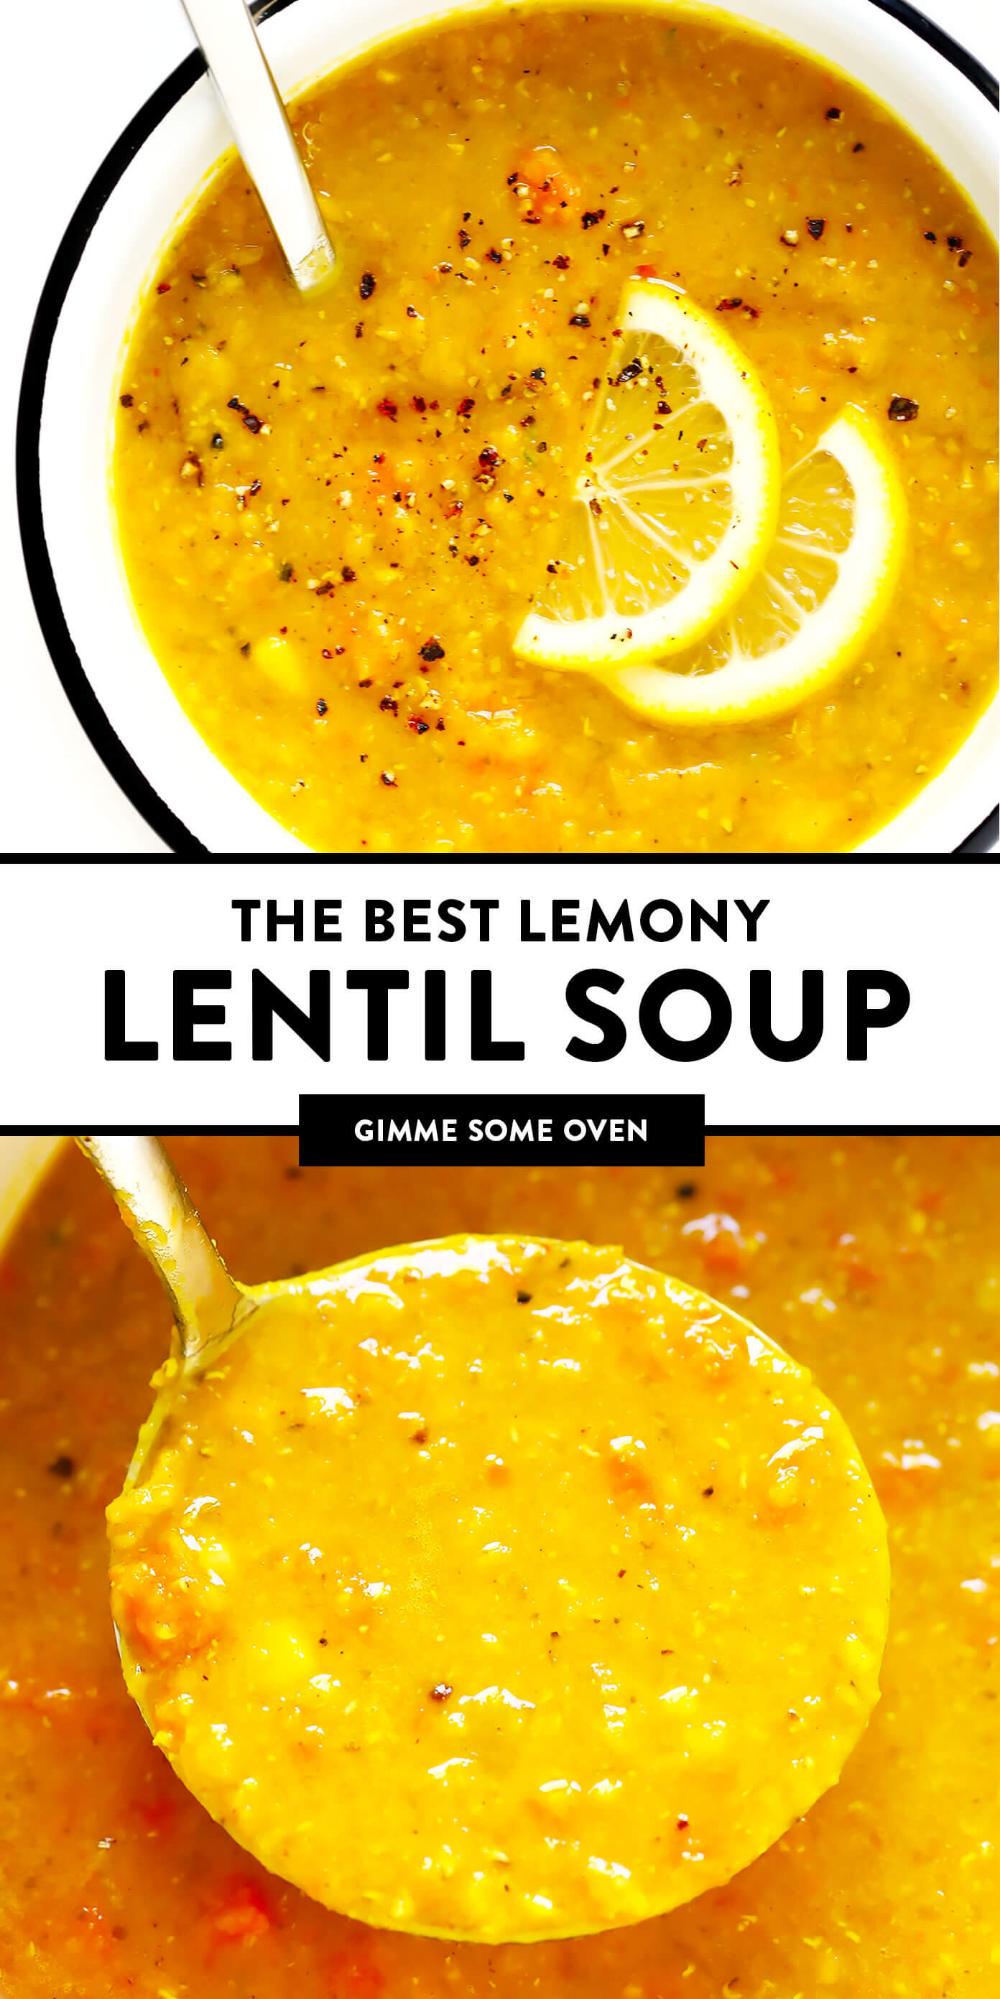 Photo of Lemony Lentil Soup | Gimme Some Oven